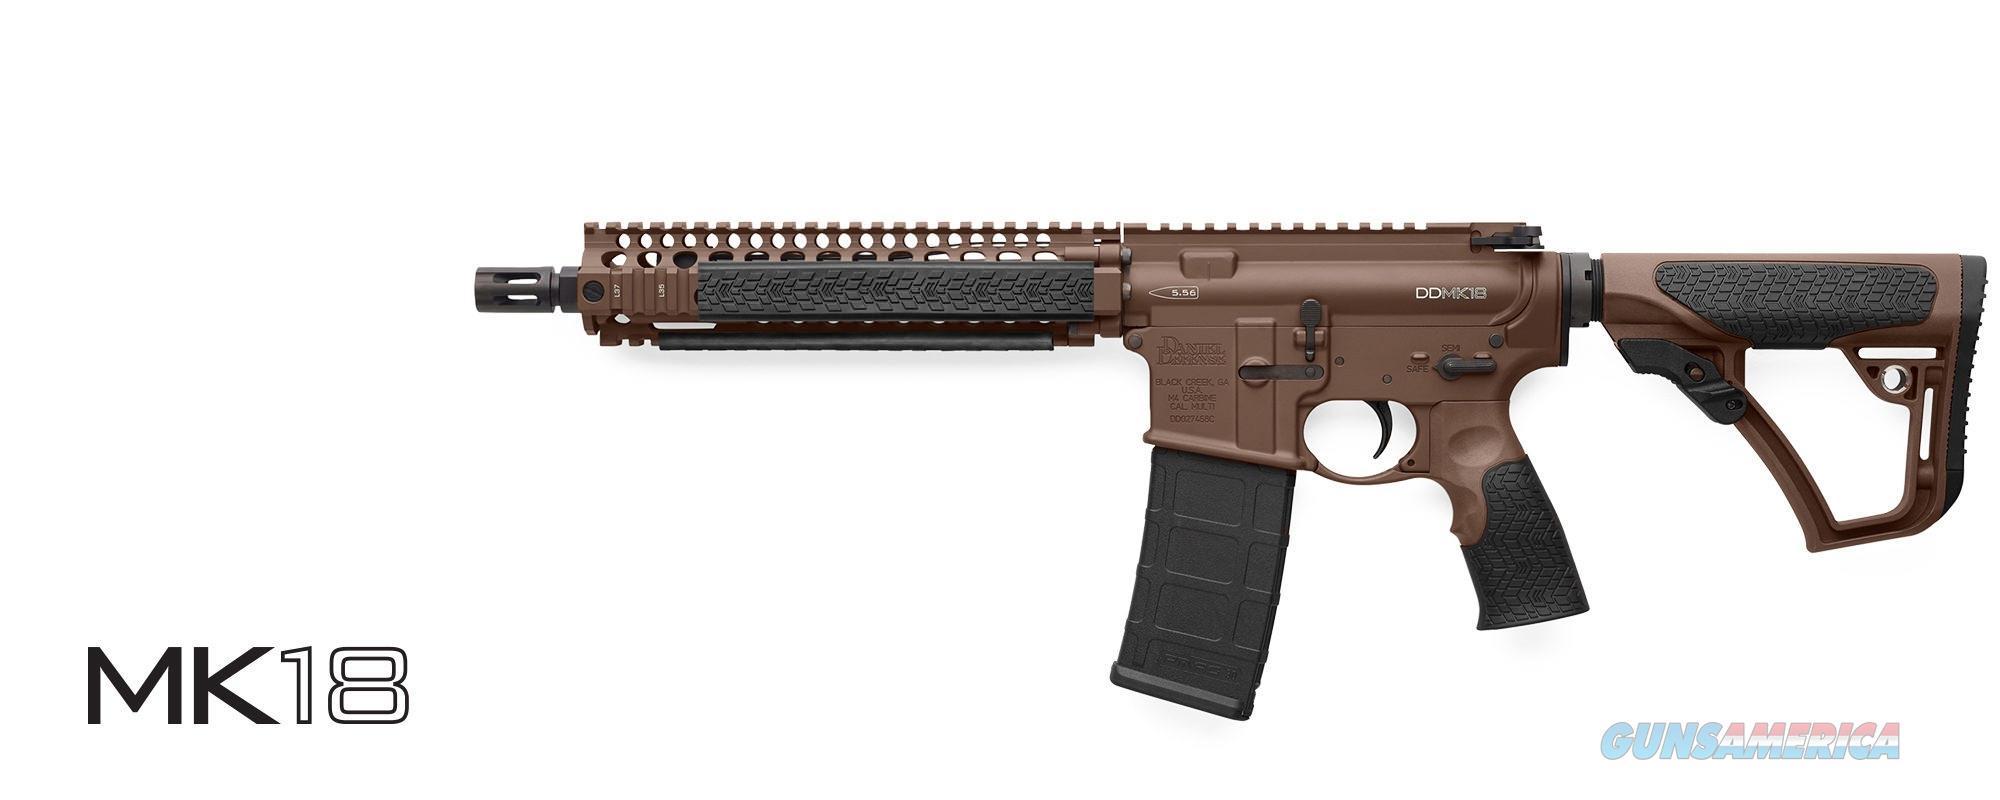 DANIEL DEFENSE MK18 SBR - MILSPEC+ BROWN IN STOCK NOW (M4 AR15) PN: 02-088-15028-011  Guns > Rifles > Daniel Defense > Complete Rifles